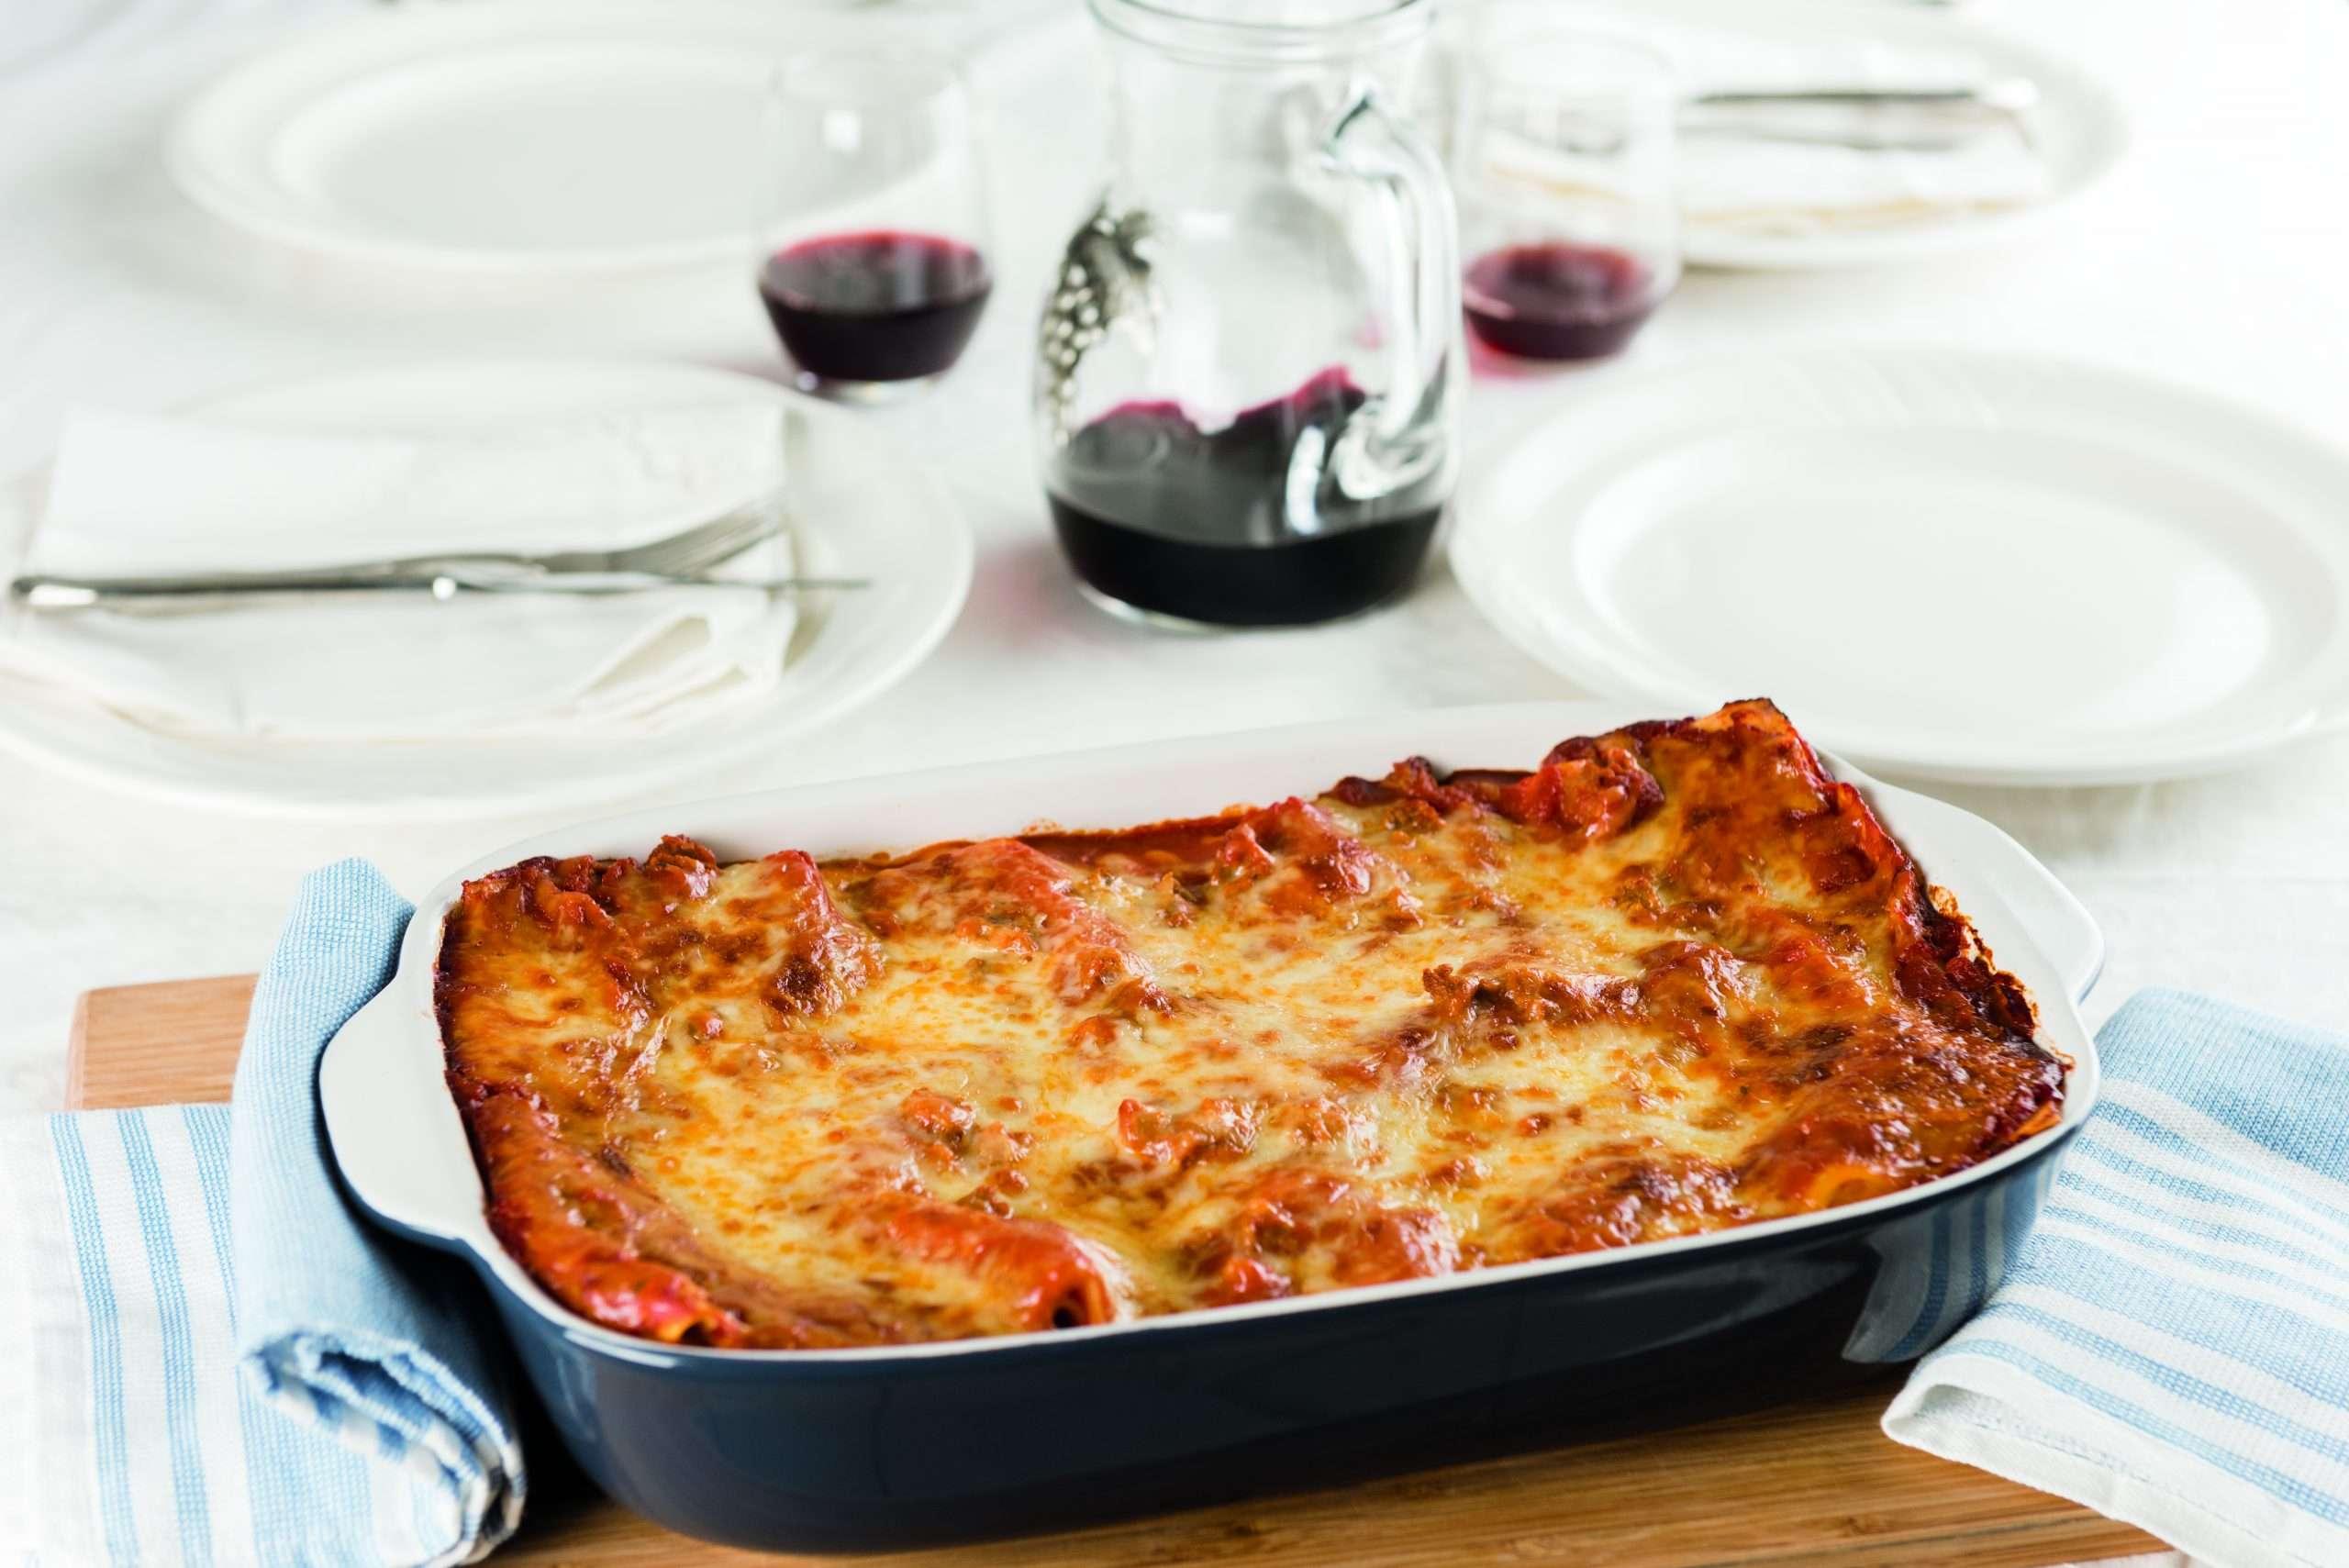 Sausage stuffed lasagna available at daily tiramisu blog by Julie Miguel